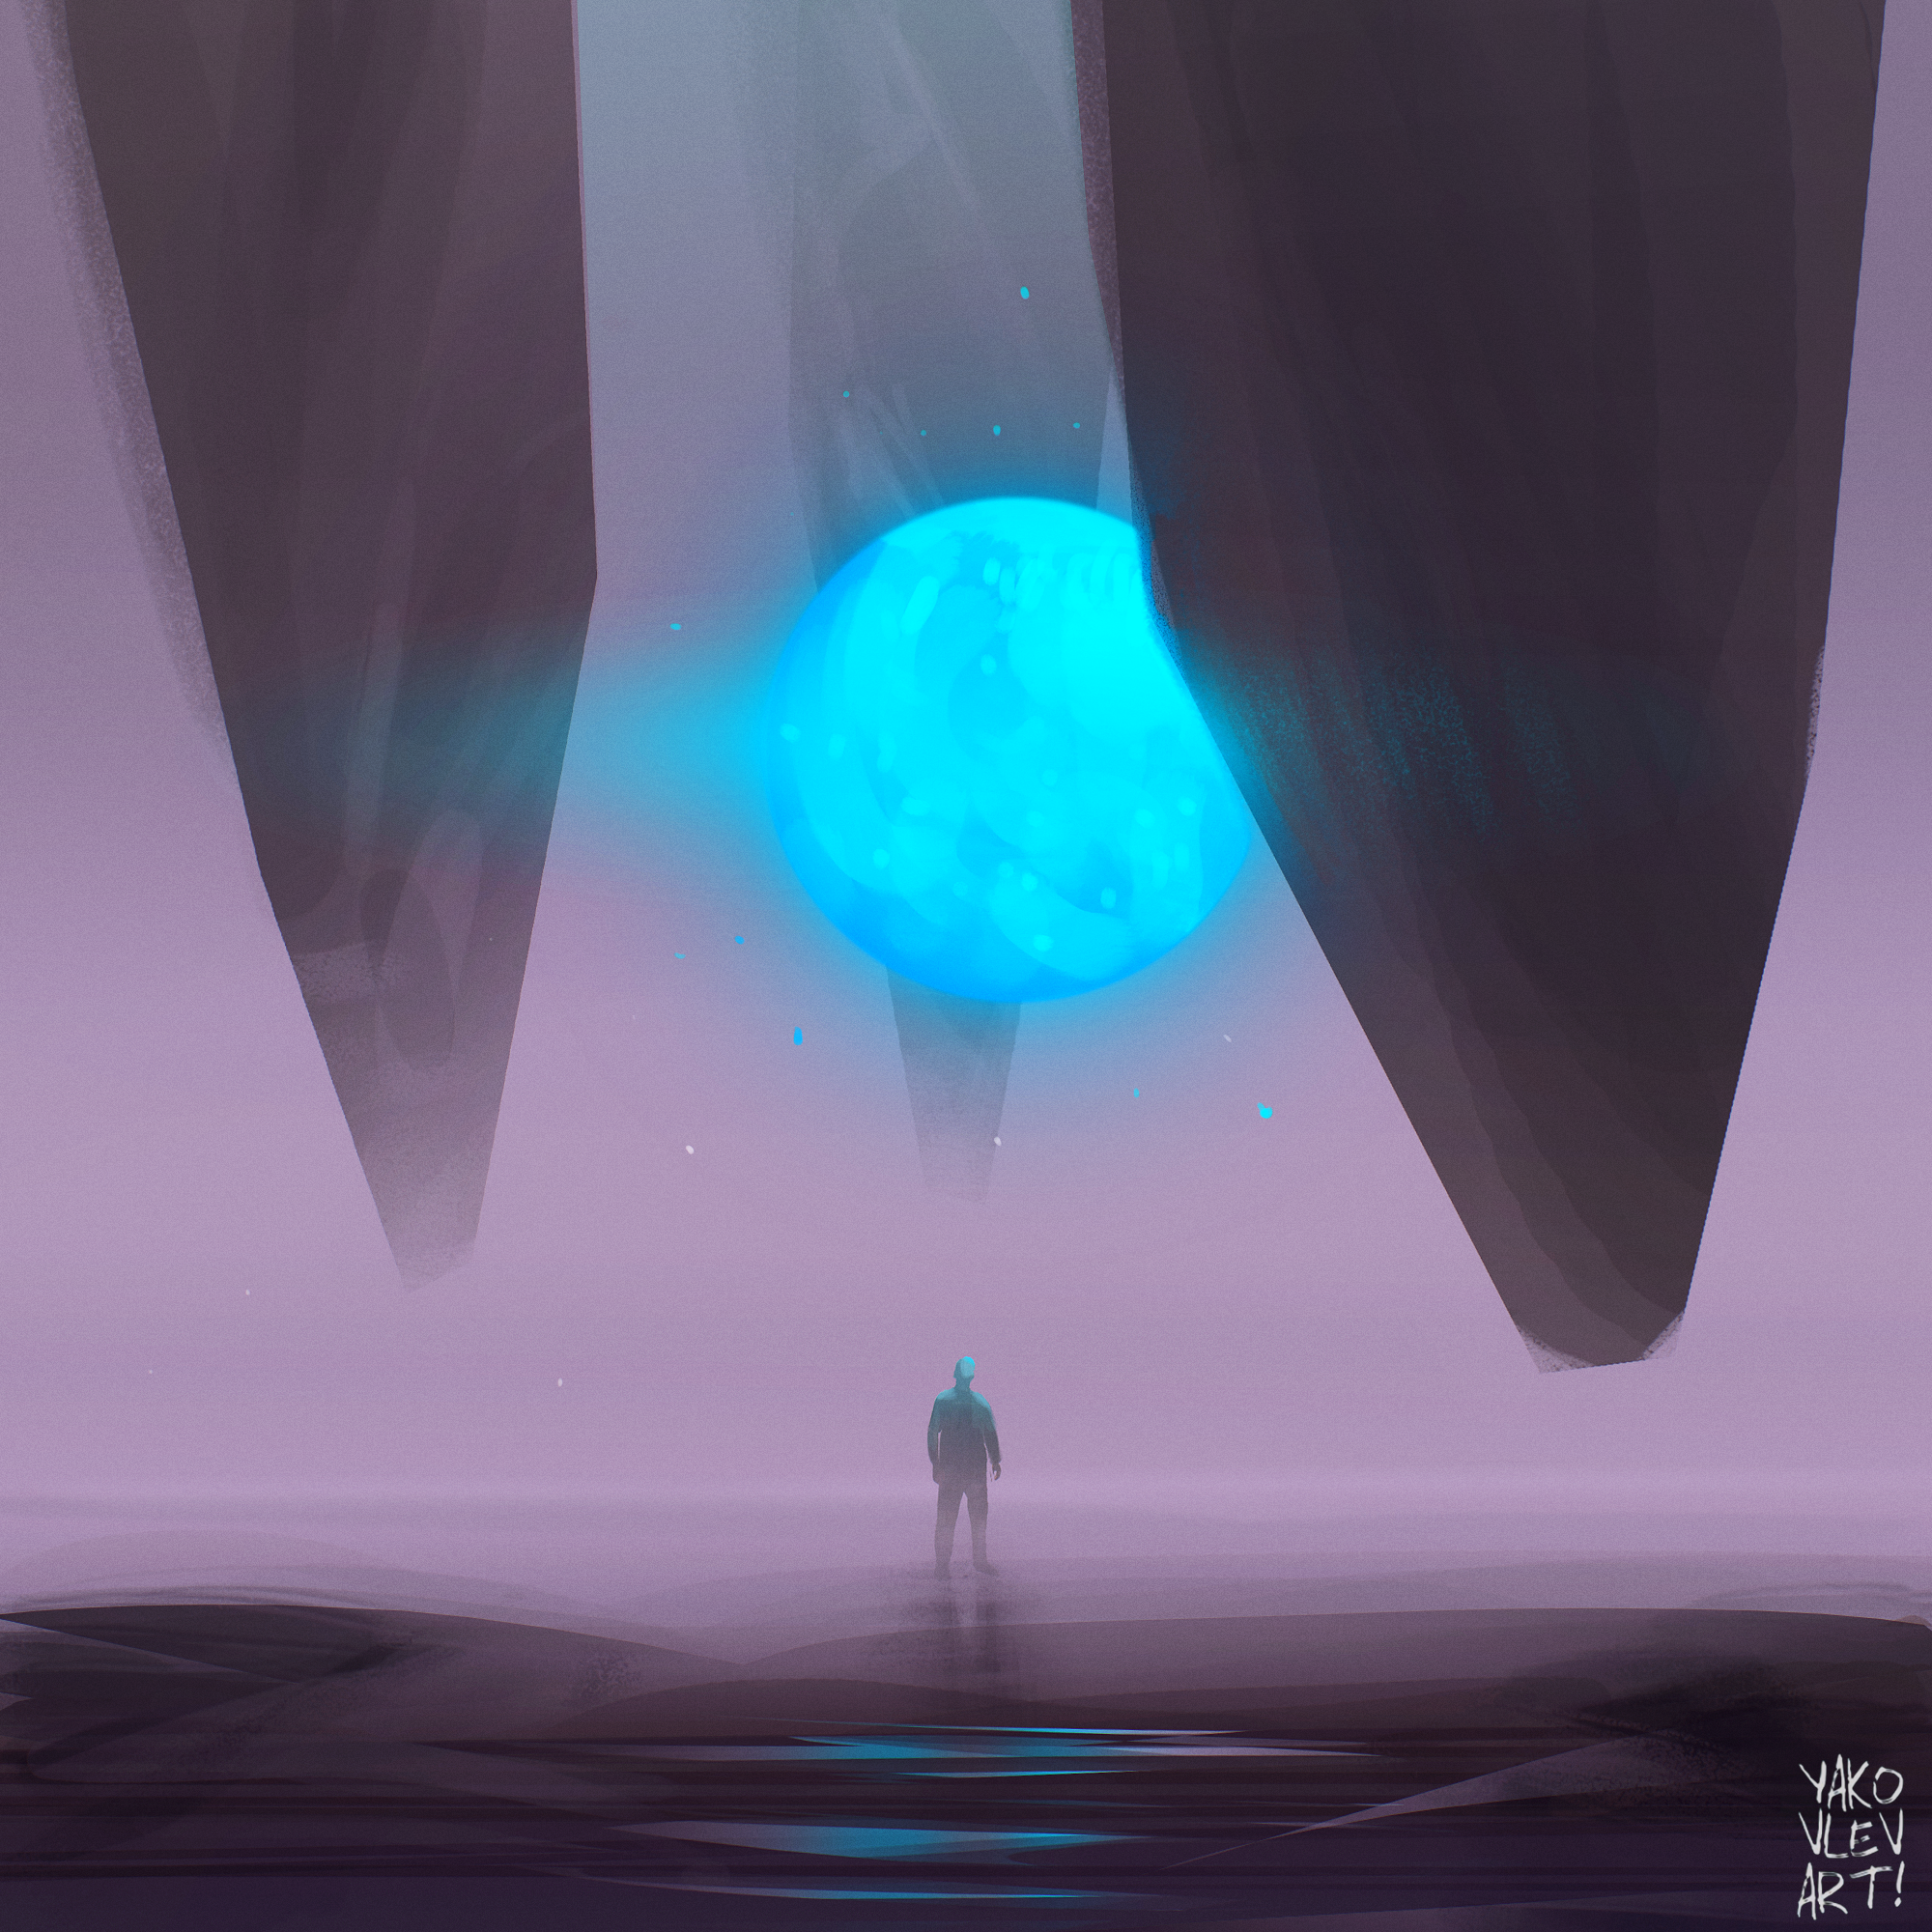 [002] Blue Star